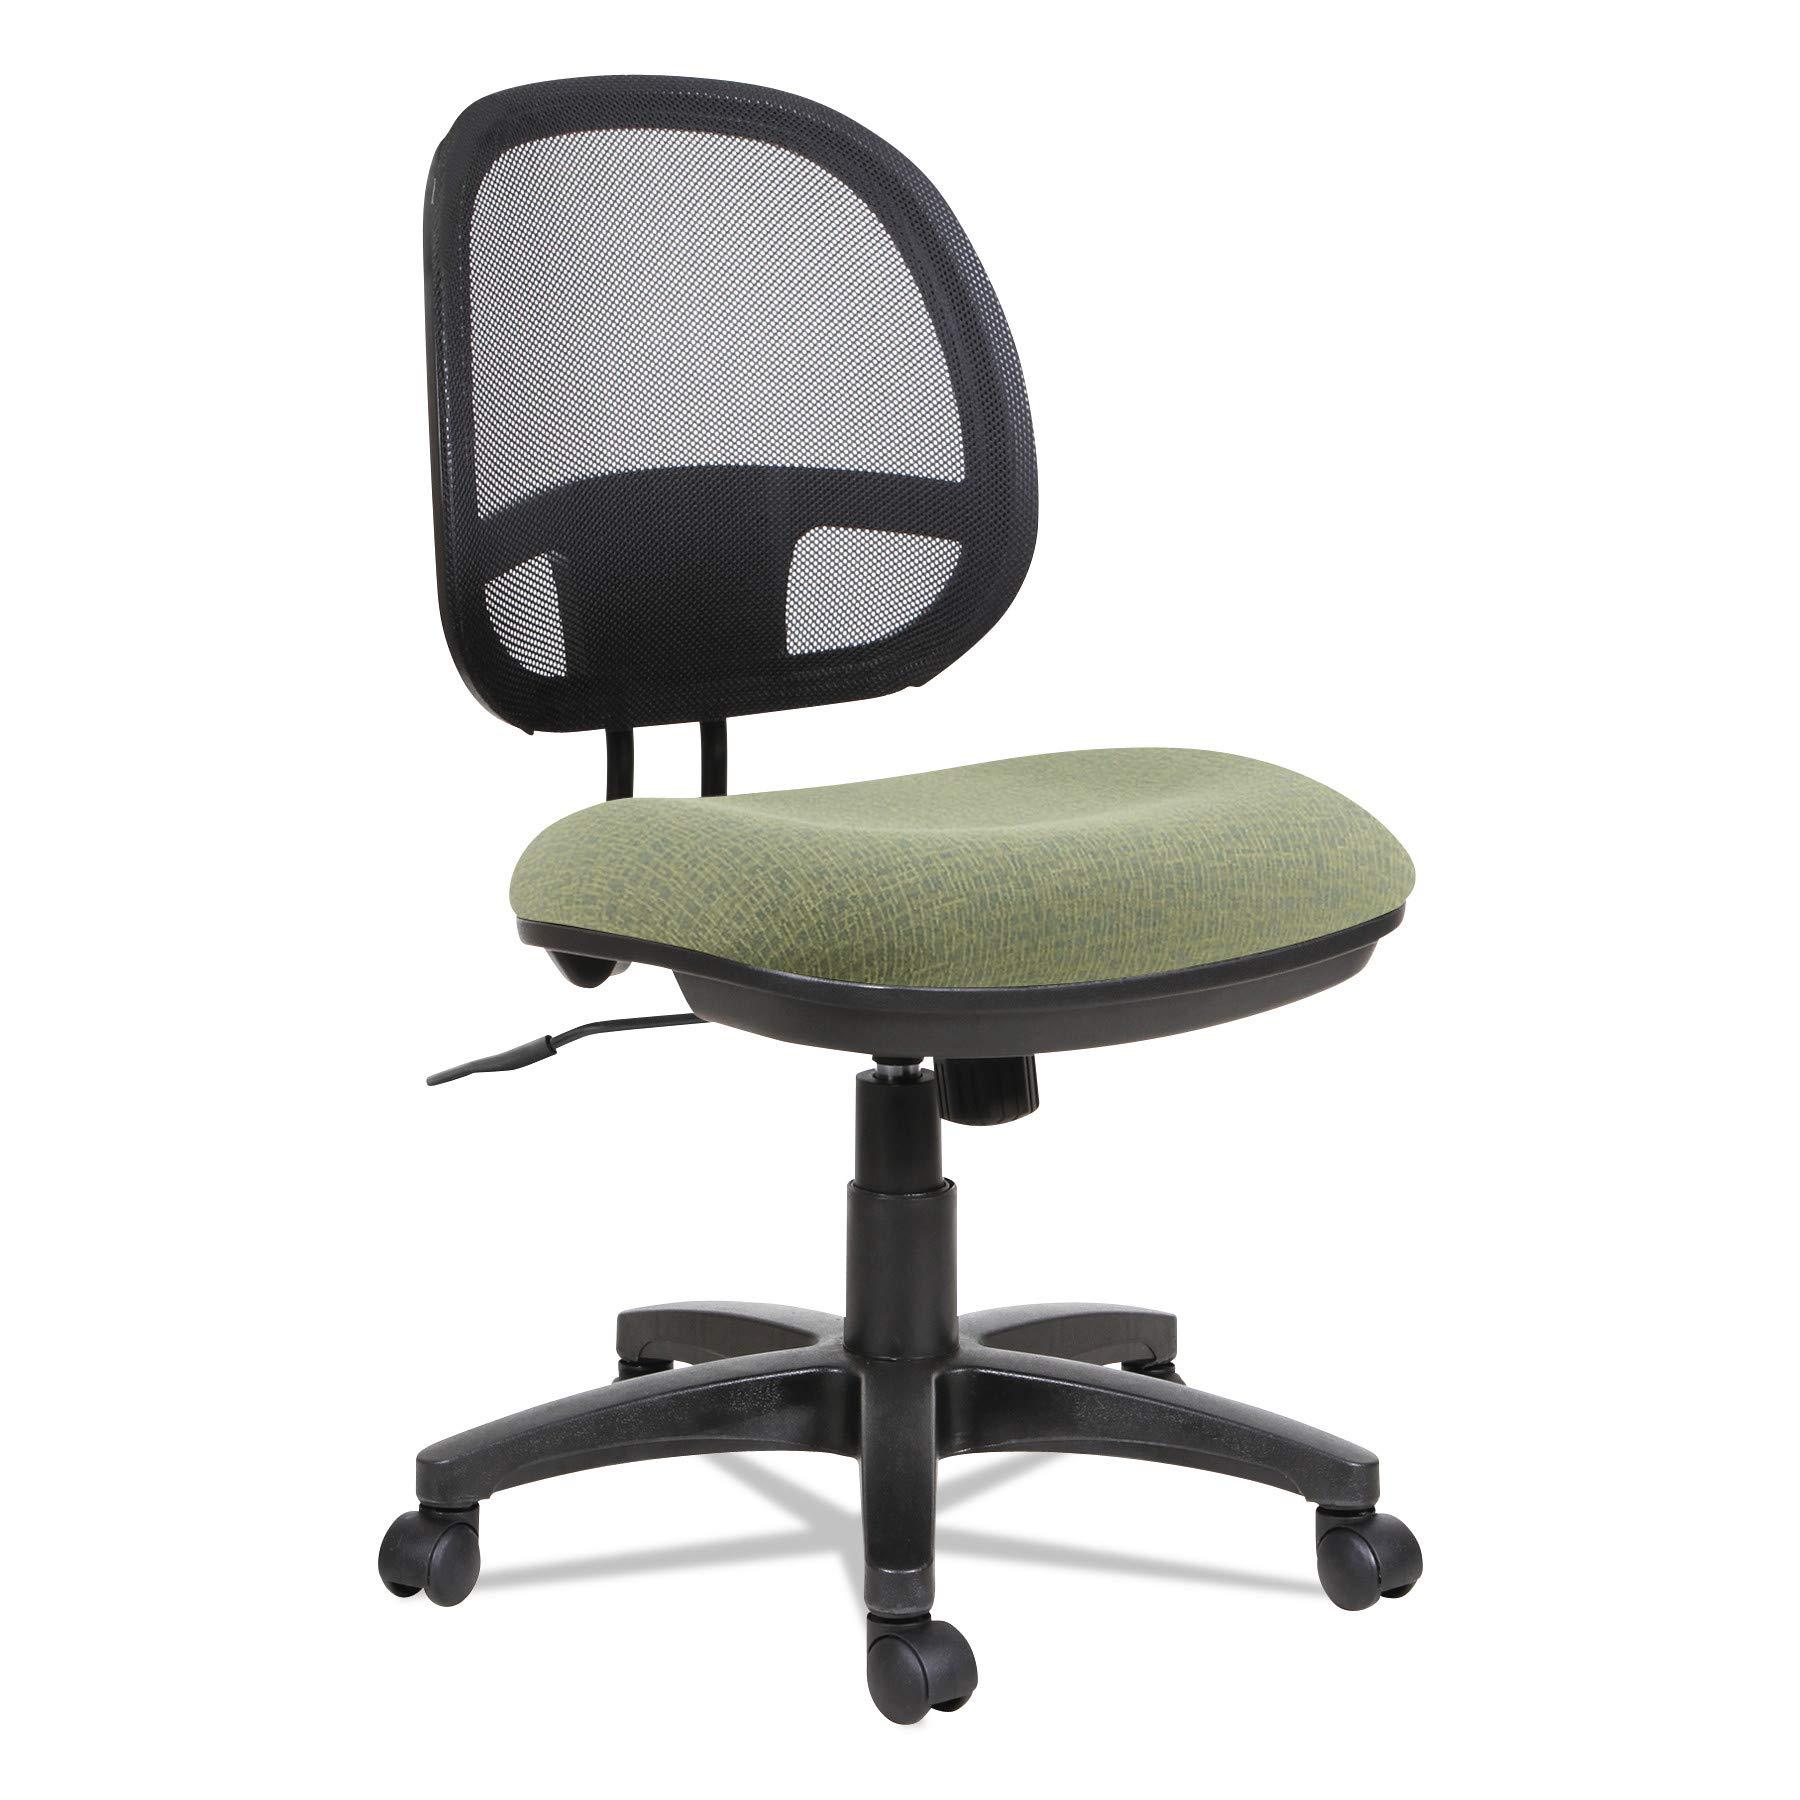 Alera ALEIN4874 Interval Series Swivel/Tilt Mesh Chair, Parrot Green